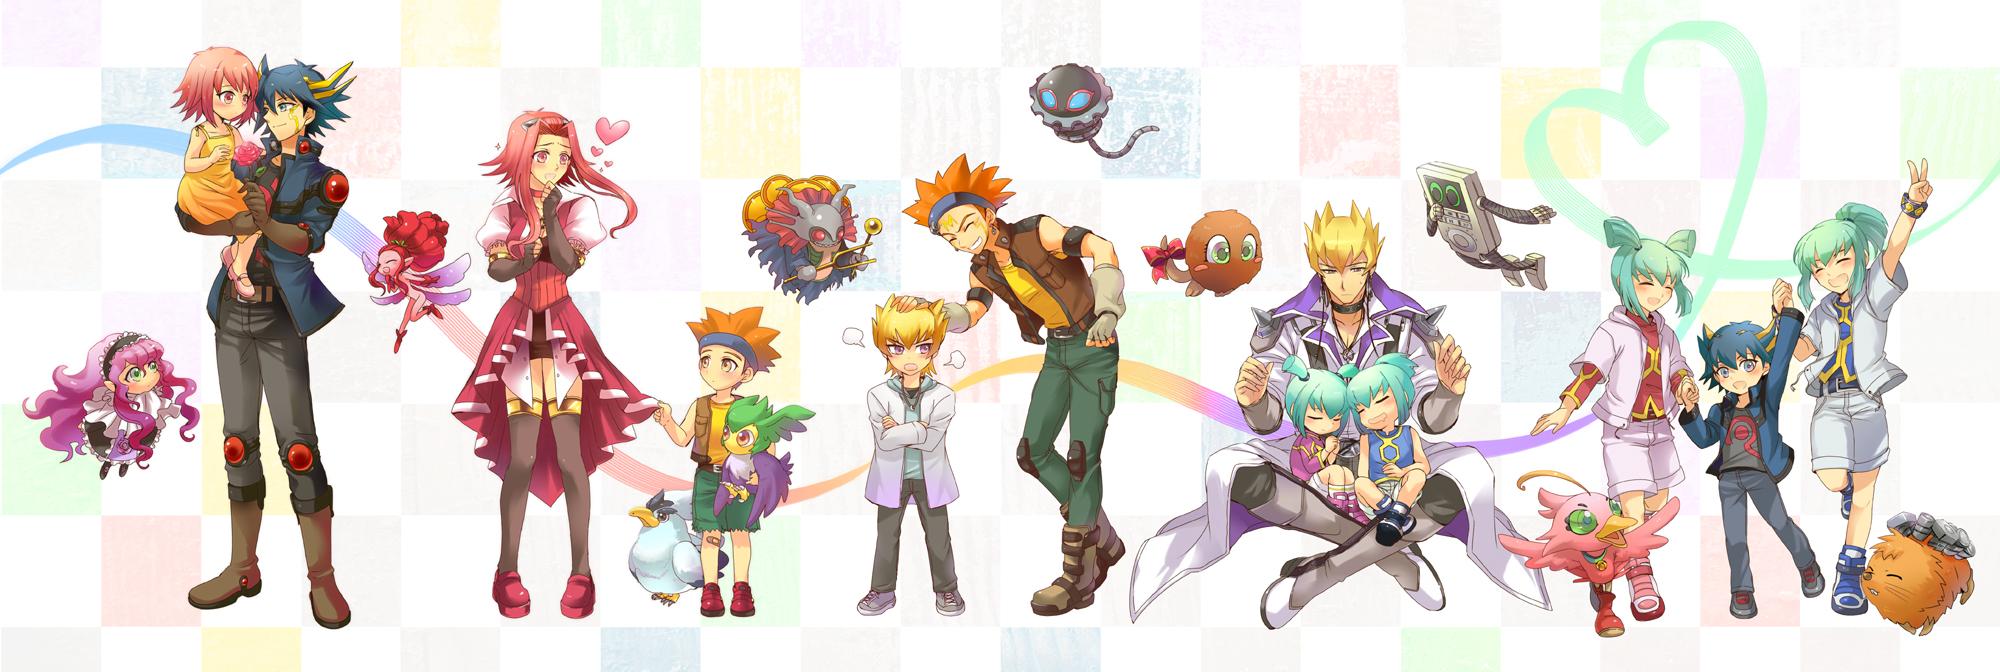 YuGiOh 5Ds Image 202030  Zerochan Anime Image Board